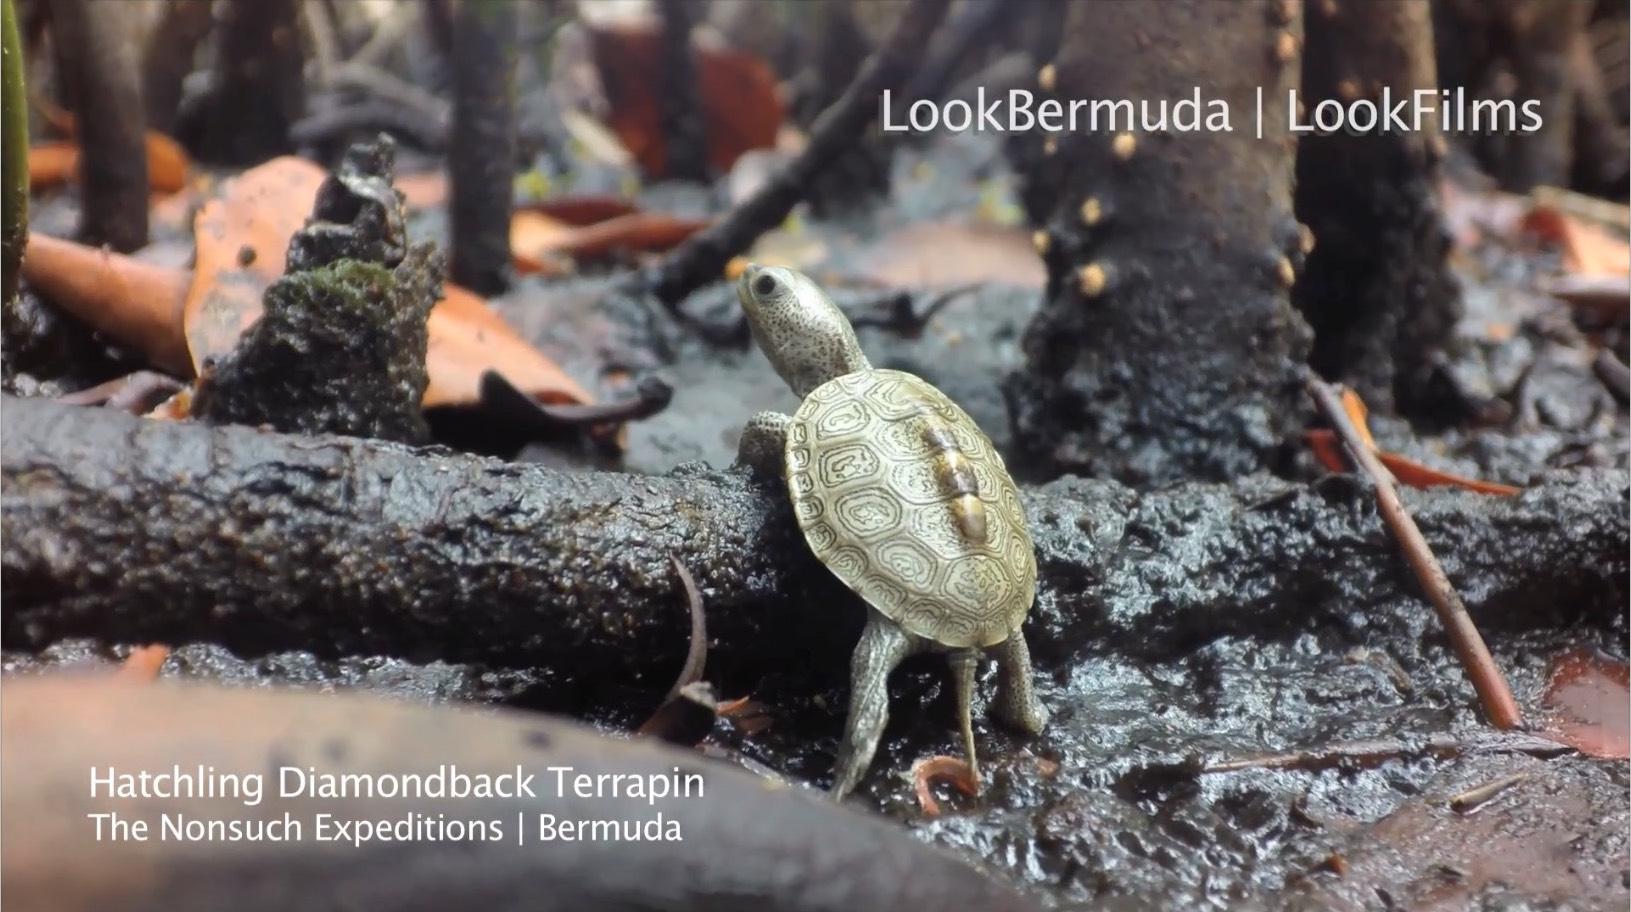 Common name: Diamondback terrapin - Scientific name: Malaclemys terrapin centrata